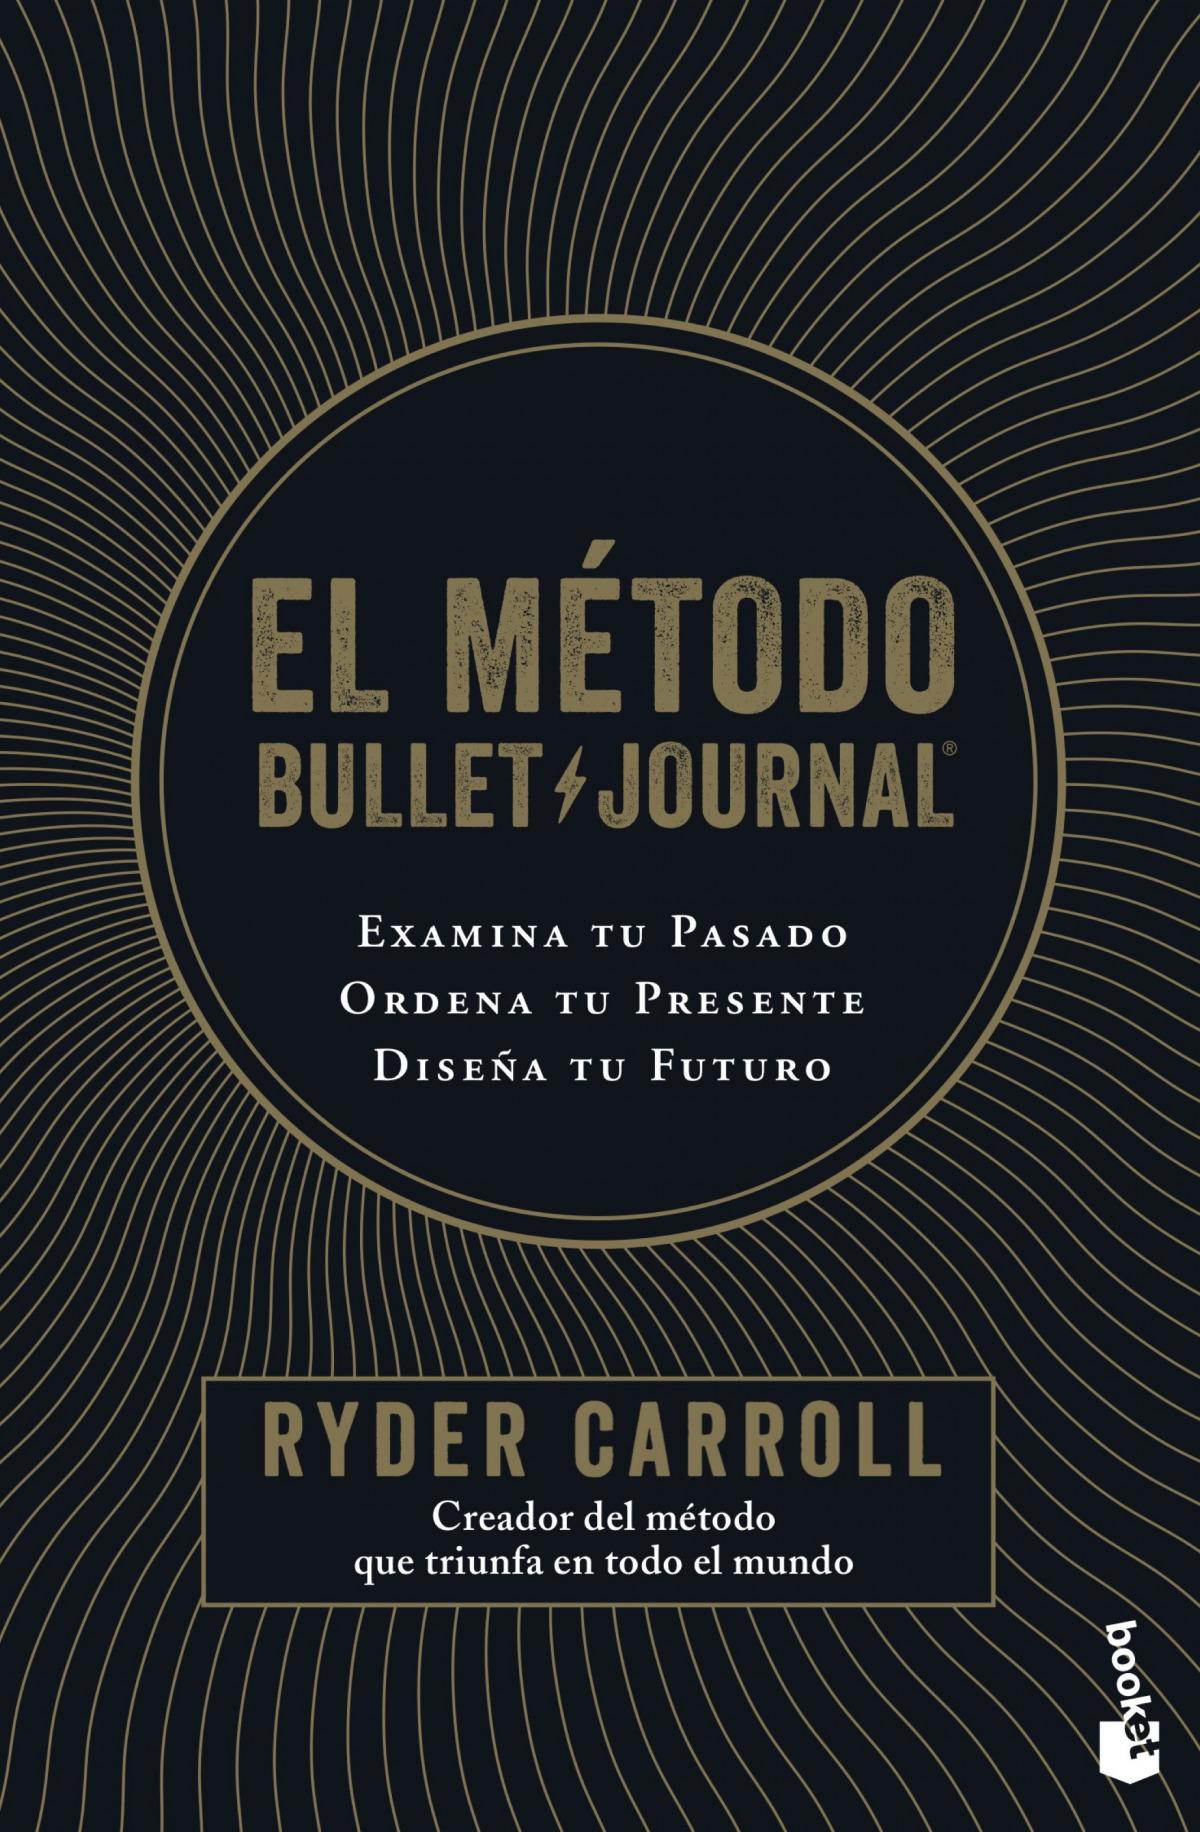 El método Bullet Journal 9788408222101